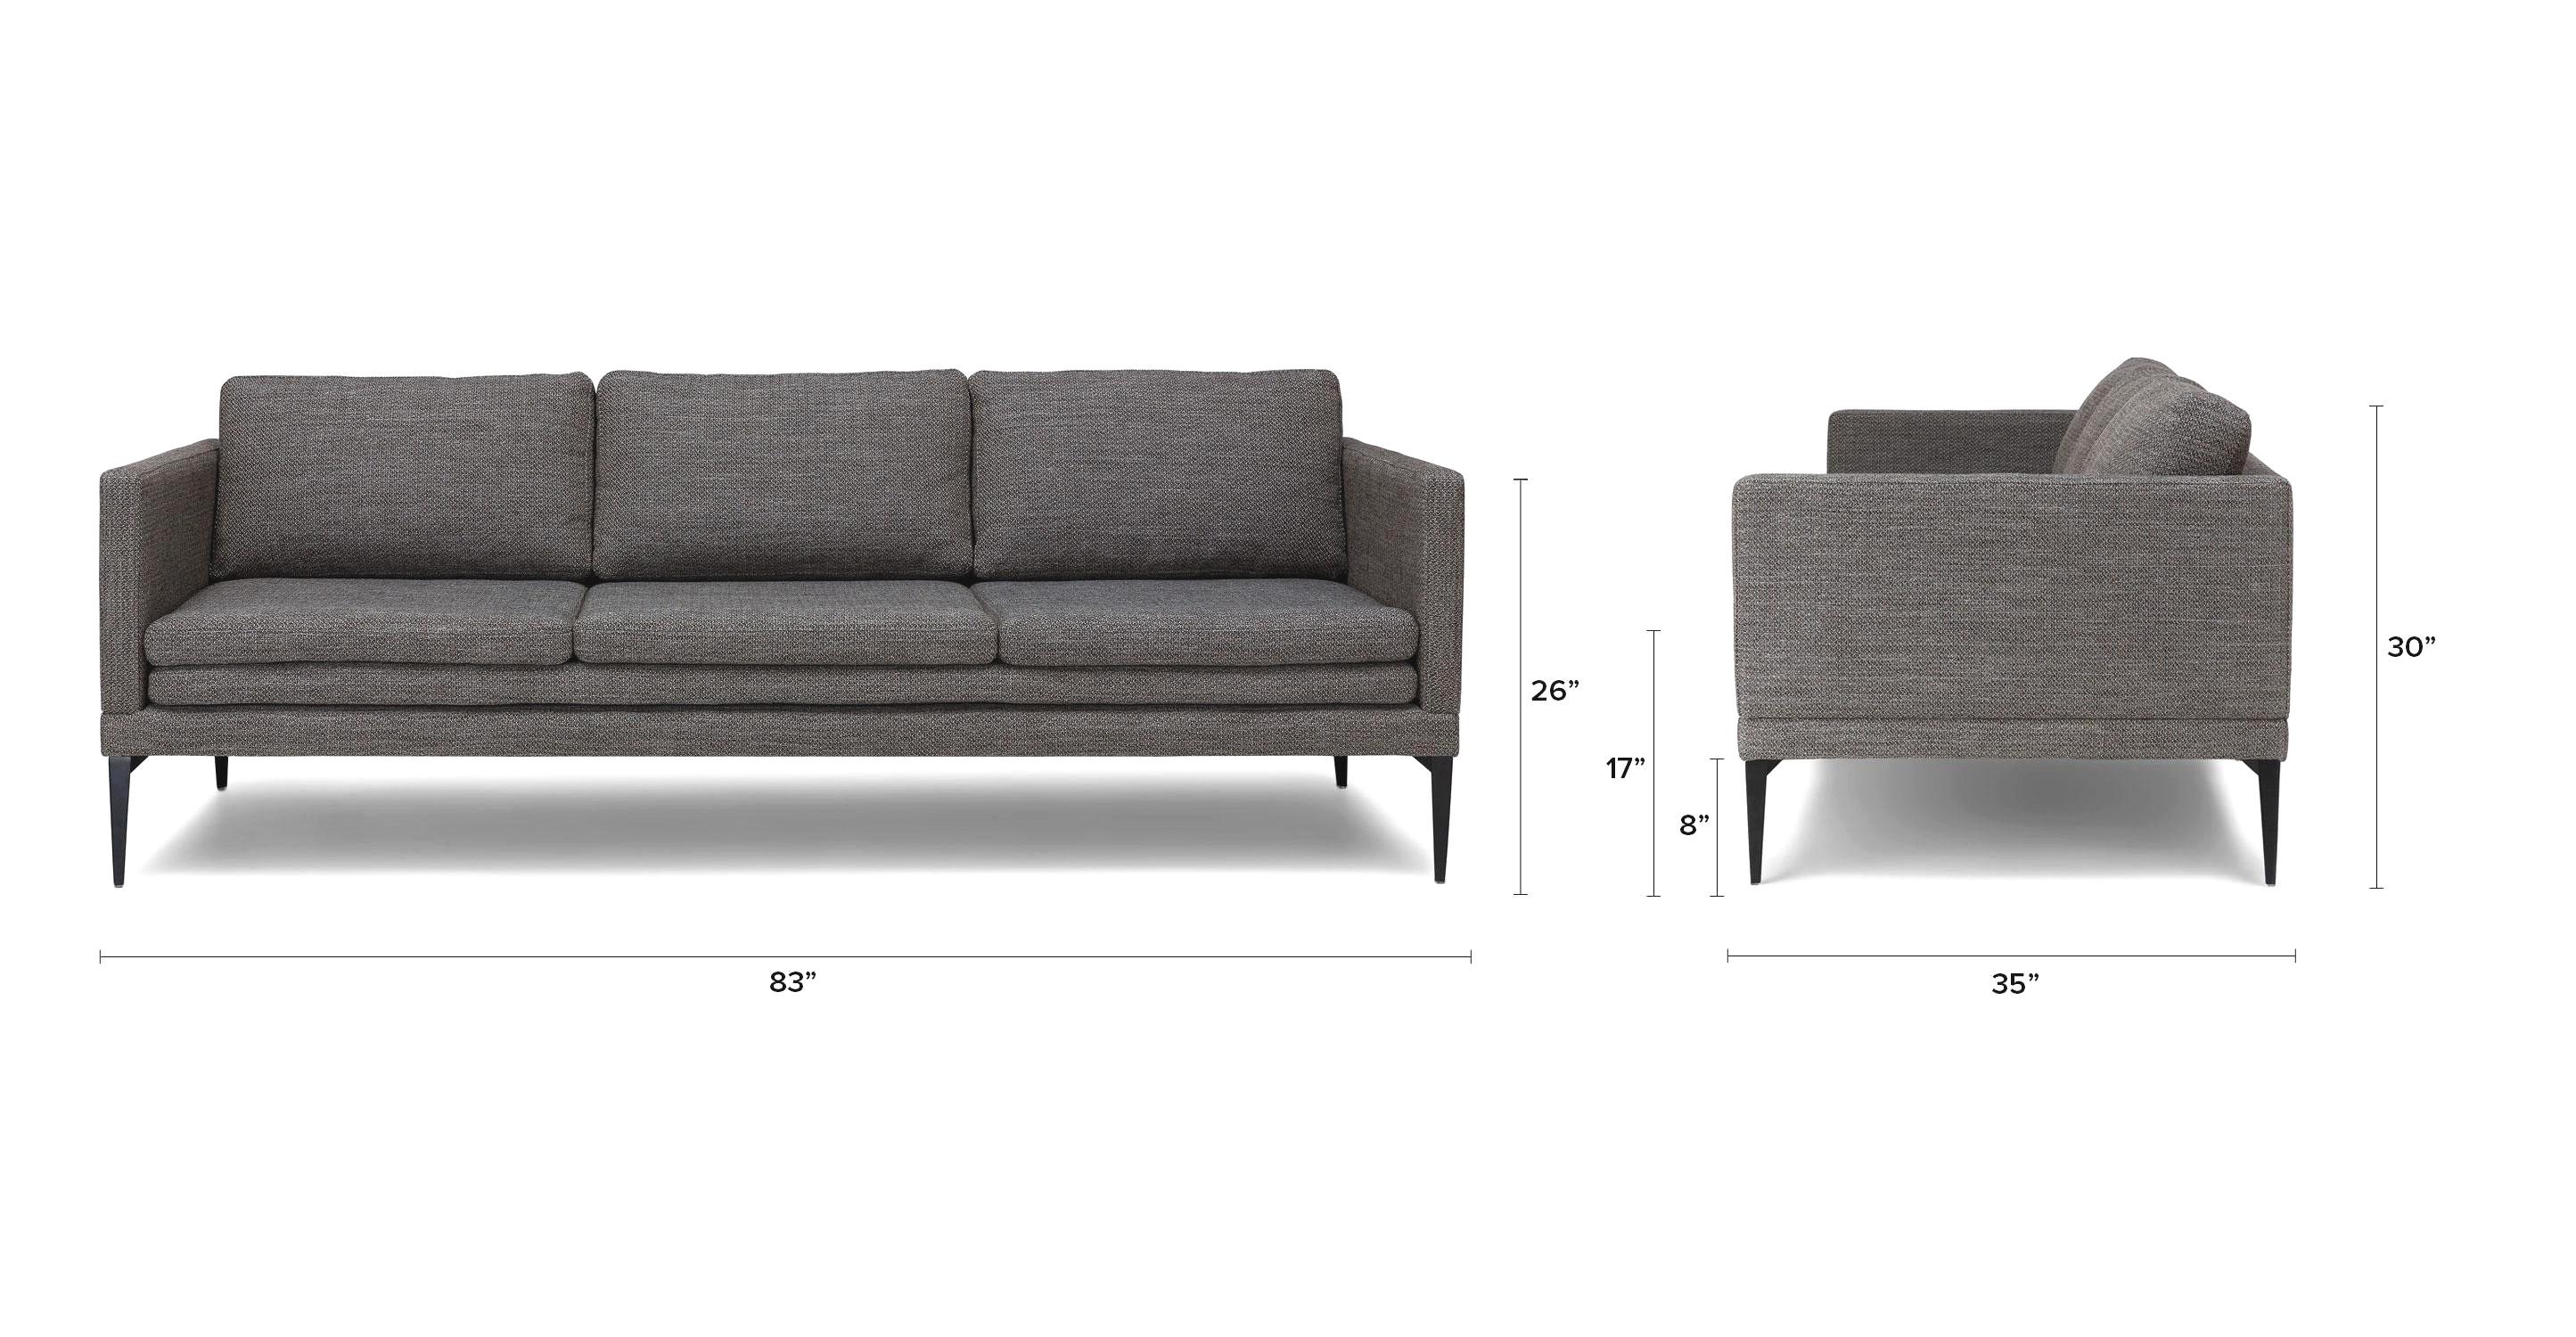 modern brown leather sofa lovely moderne couchgarnituren inspirierend small backyard furniture ideas